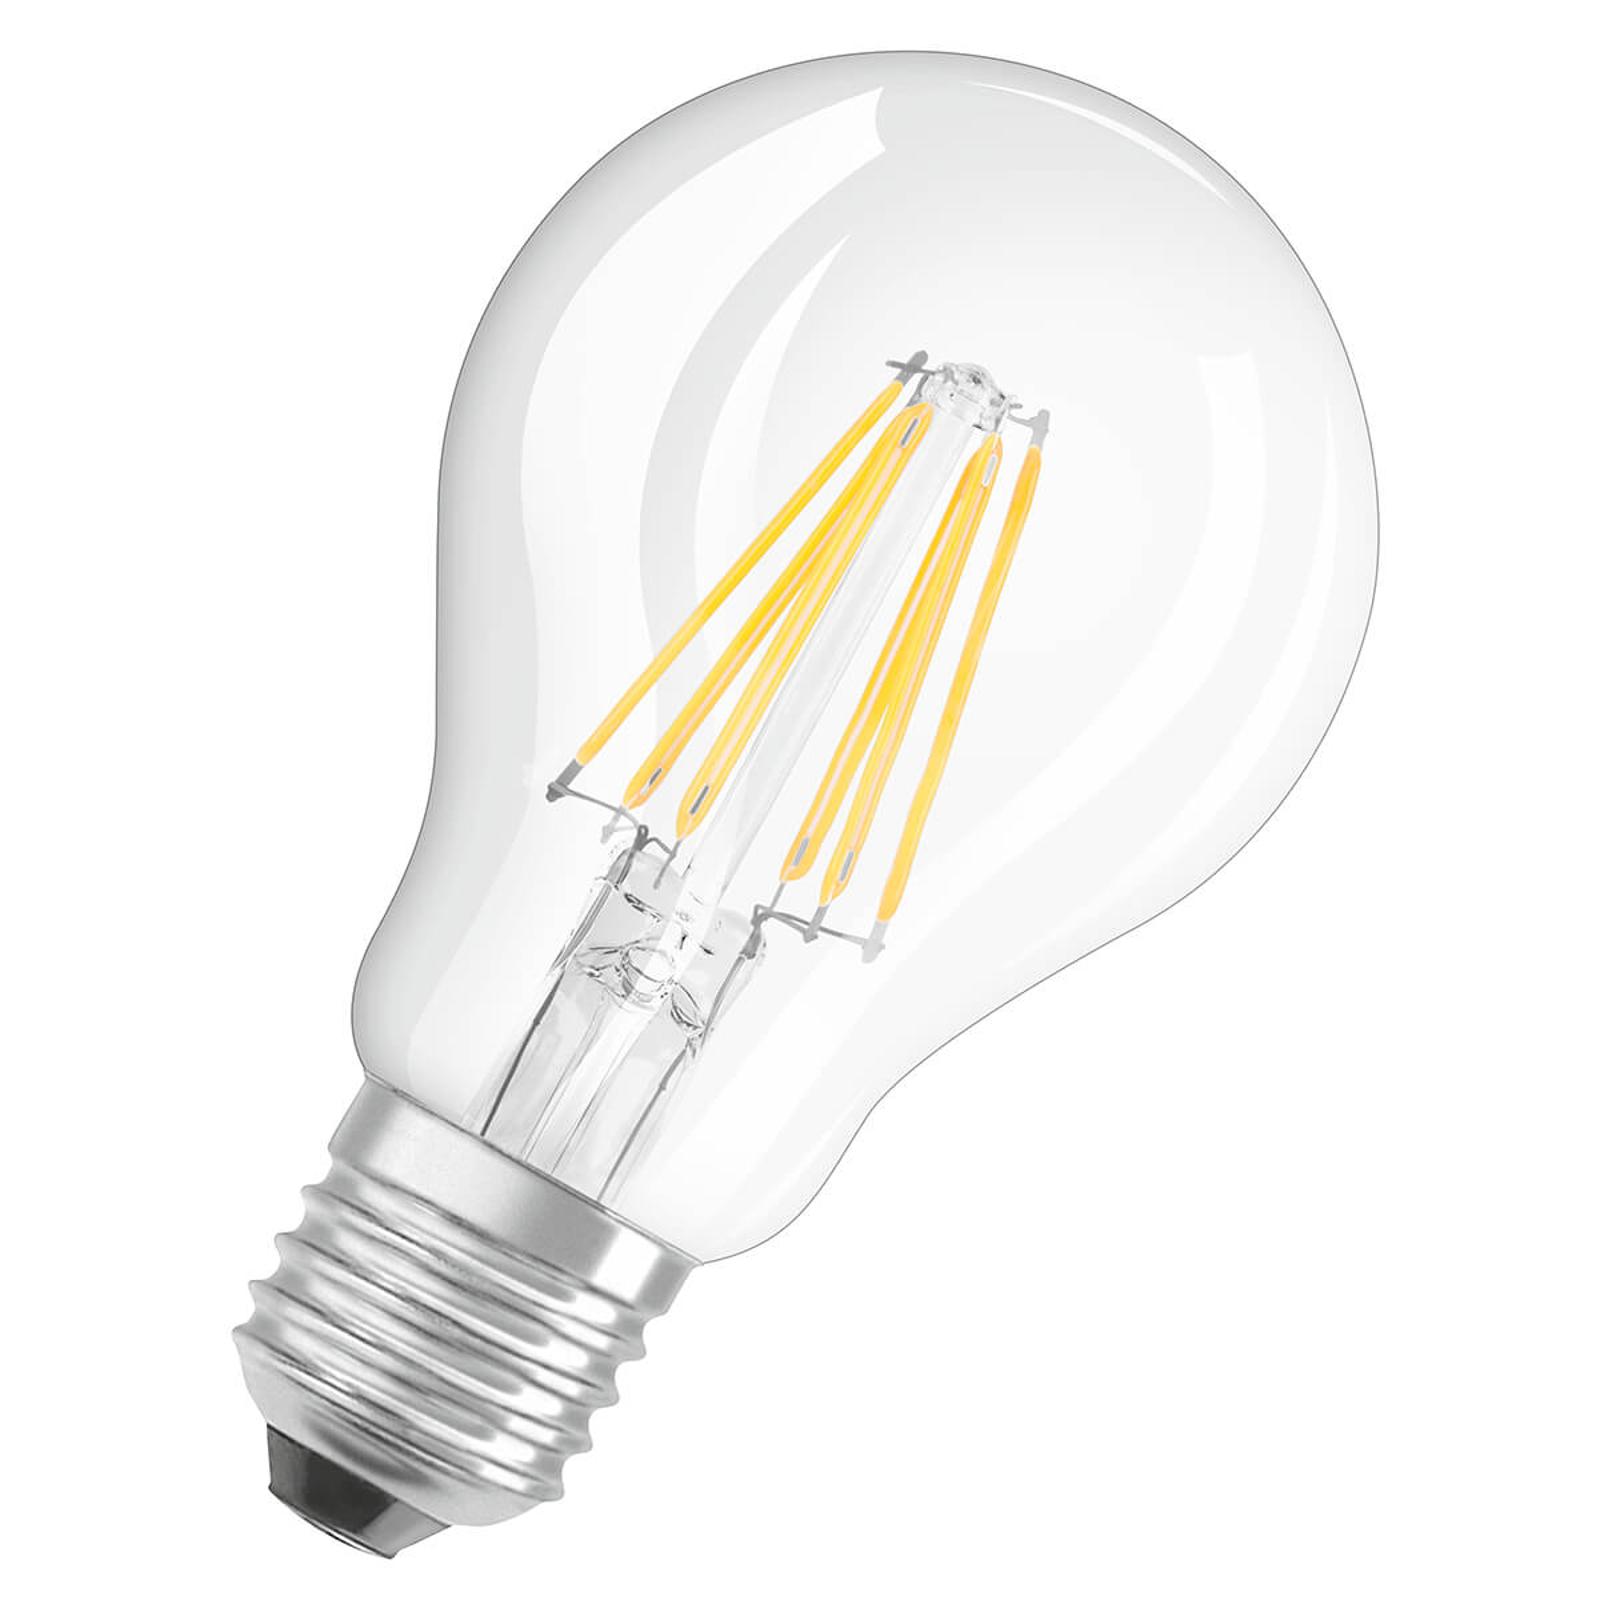 LED-Filamentlampe E27 7,5W, warmweiß, dimmbar